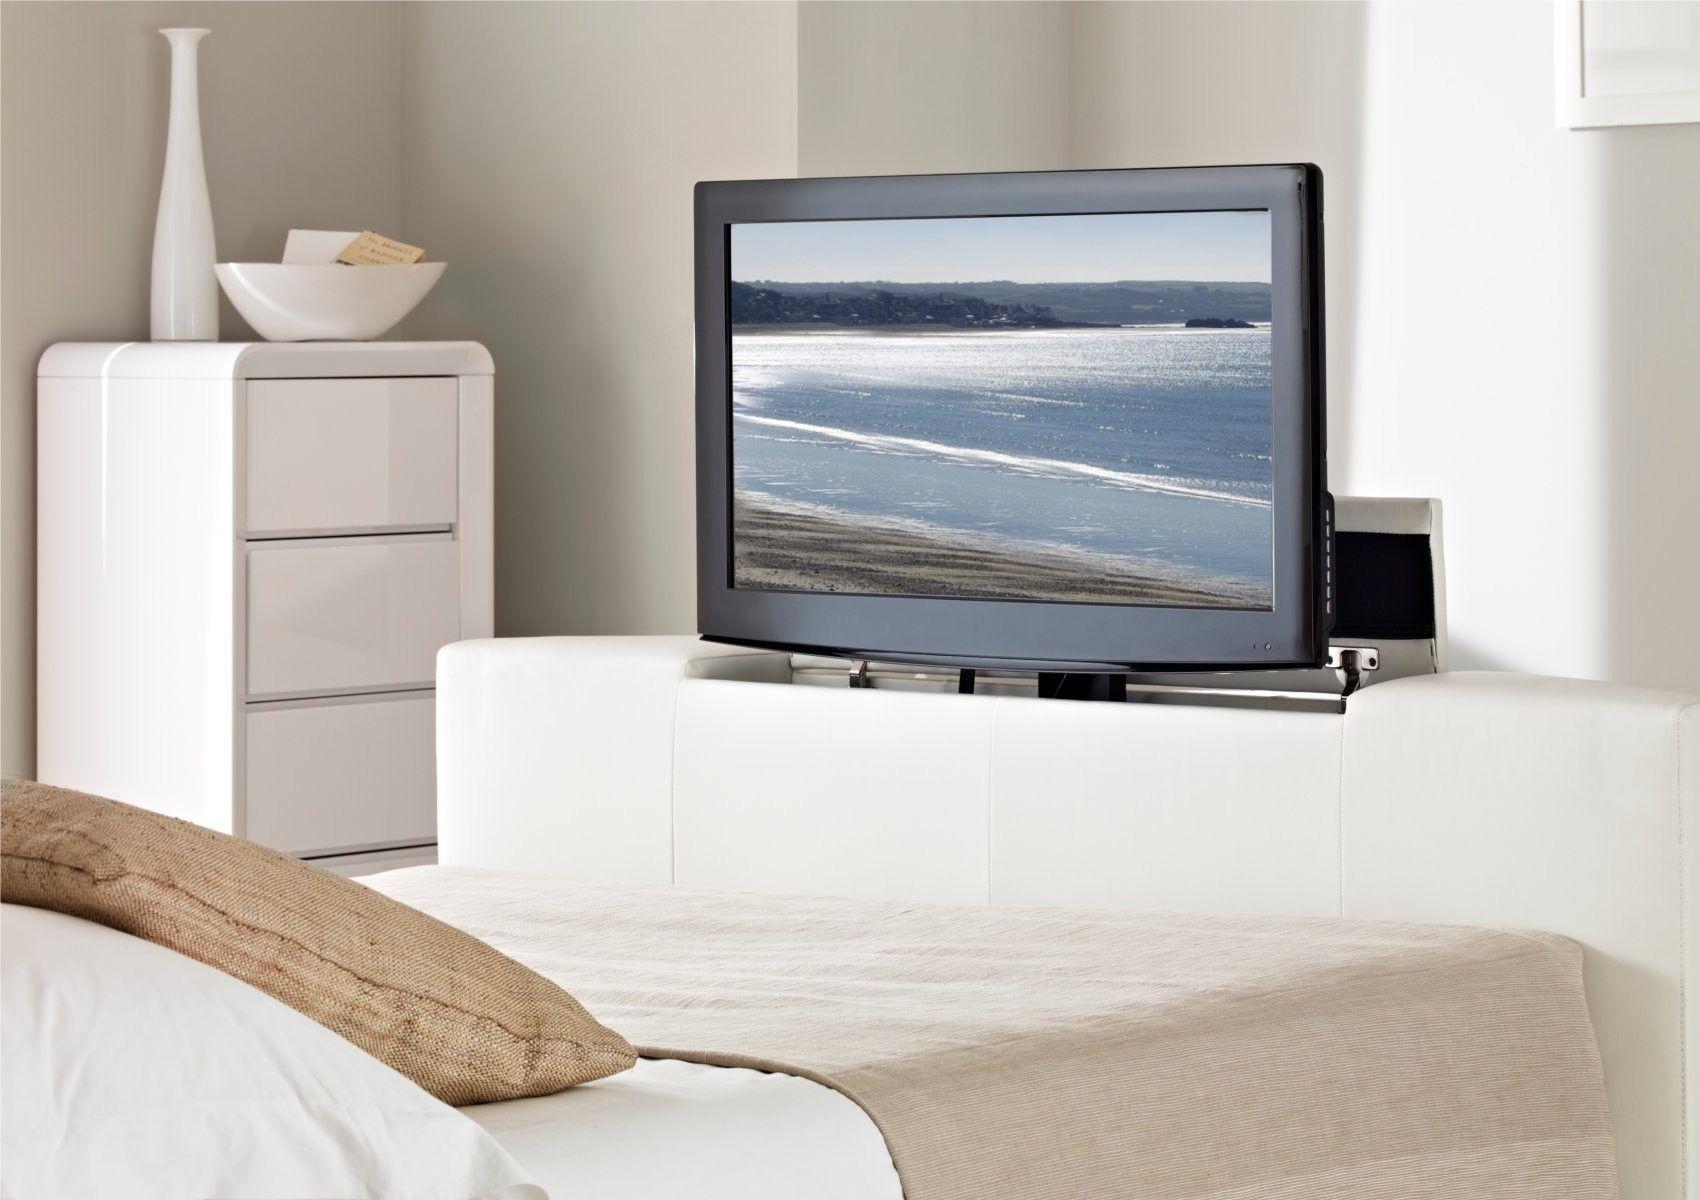 Cool Atlantis Leather Ottoman Tv Bed White Ottoman Beds Machost Co Dining Chair Design Ideas Machostcouk